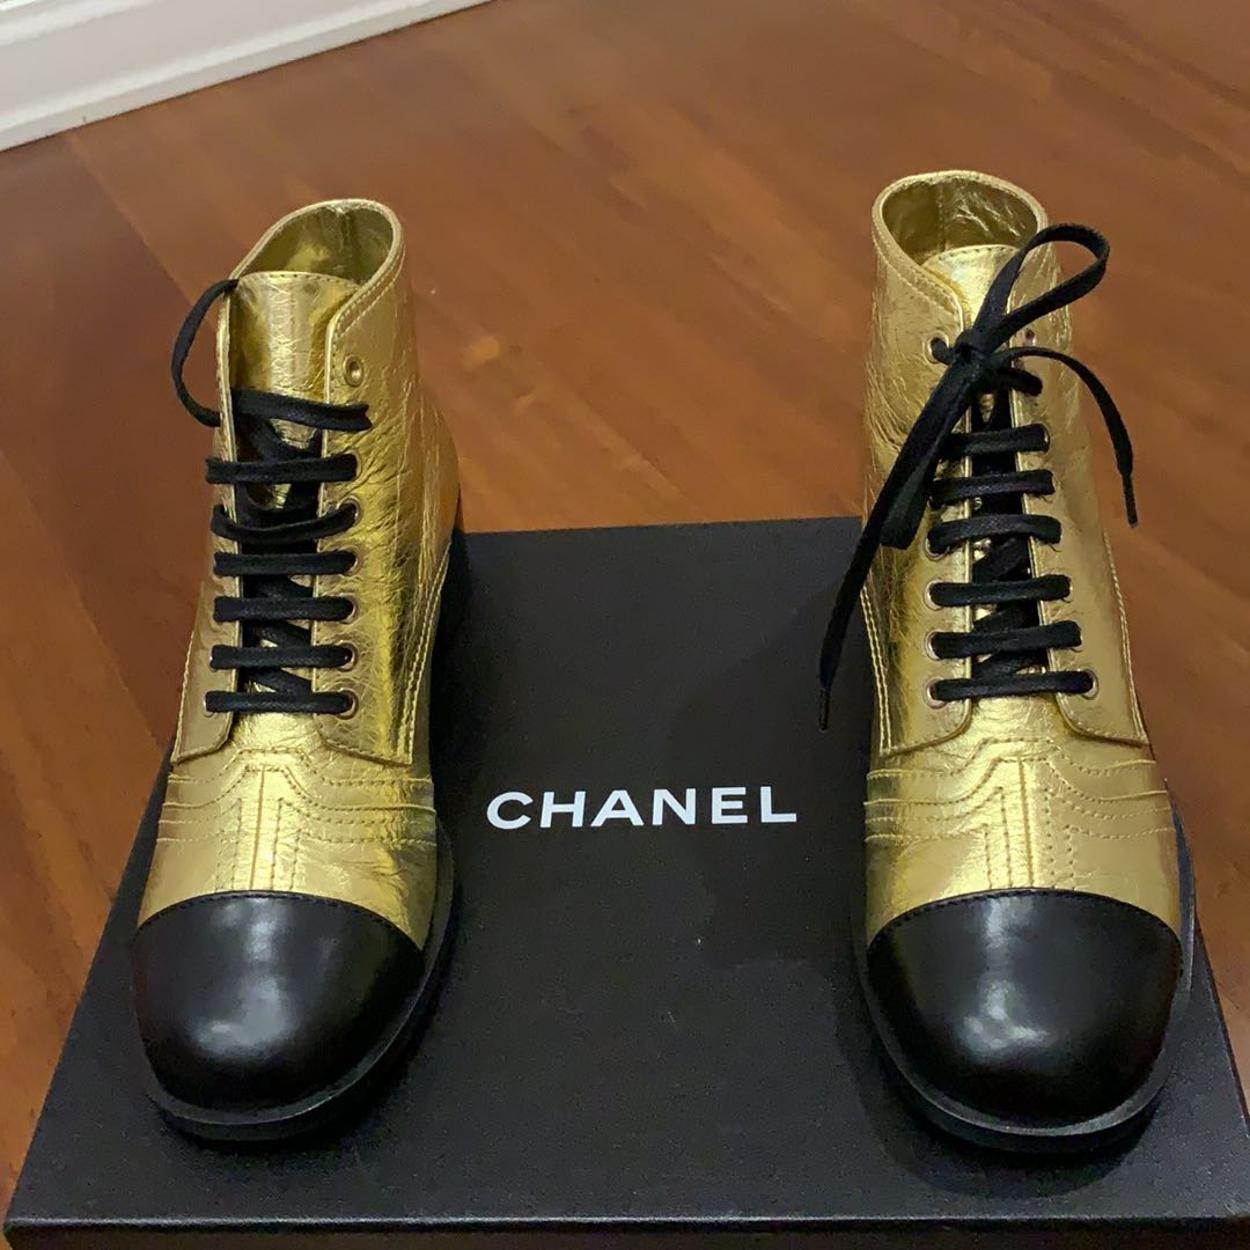 Chanel Kalın Topuklu